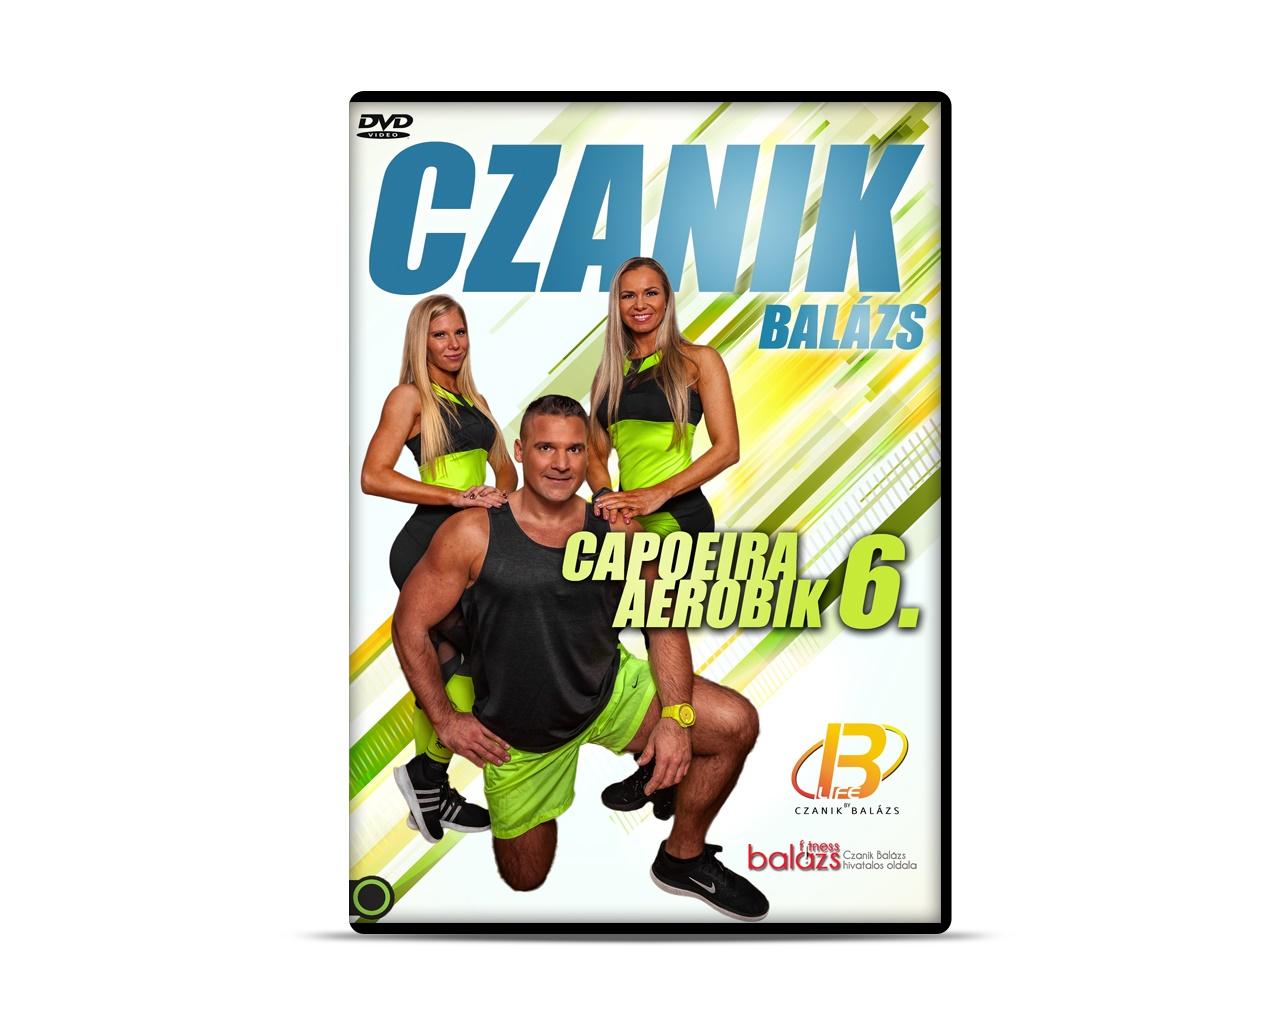 Czanik Balázs - Capoeira aerobik 6. - DVD